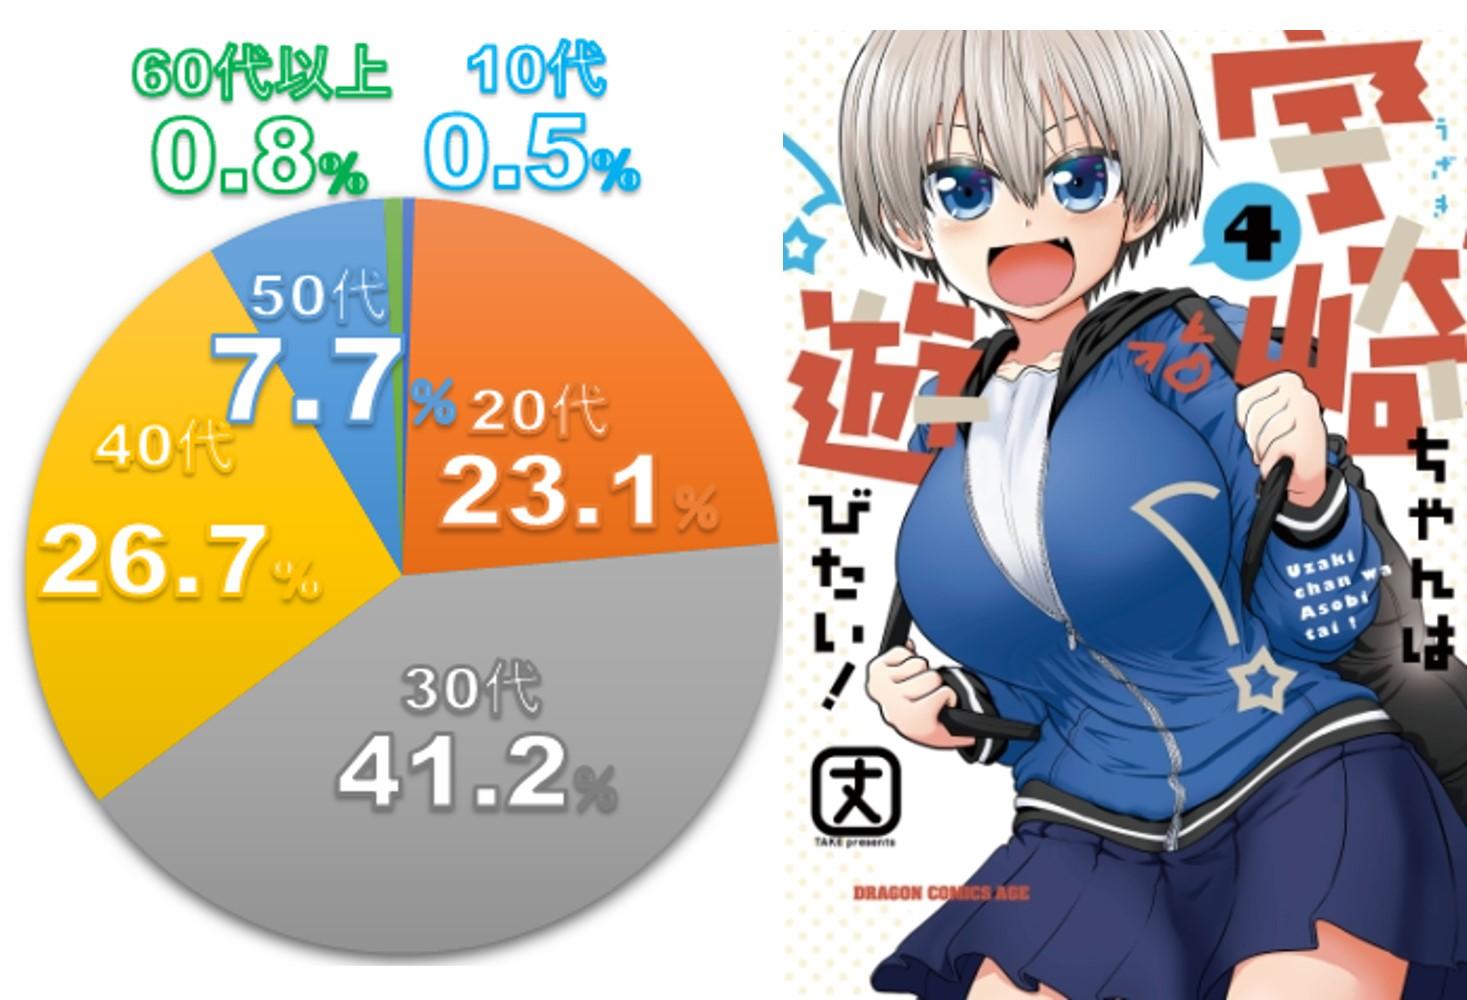 %e3%82%a2%e3%83%8b%e3%83%a1%e5%8e%9f%e4%bd%9c%e6%9c%ac%e3%83%a9%e3%83%b3%e3%82%ad%e3%83%b3%e3%82%b0-anime-ranking-%e5%8b%95%e6%bc%ab%e6%8e%92%e5%90%8d6